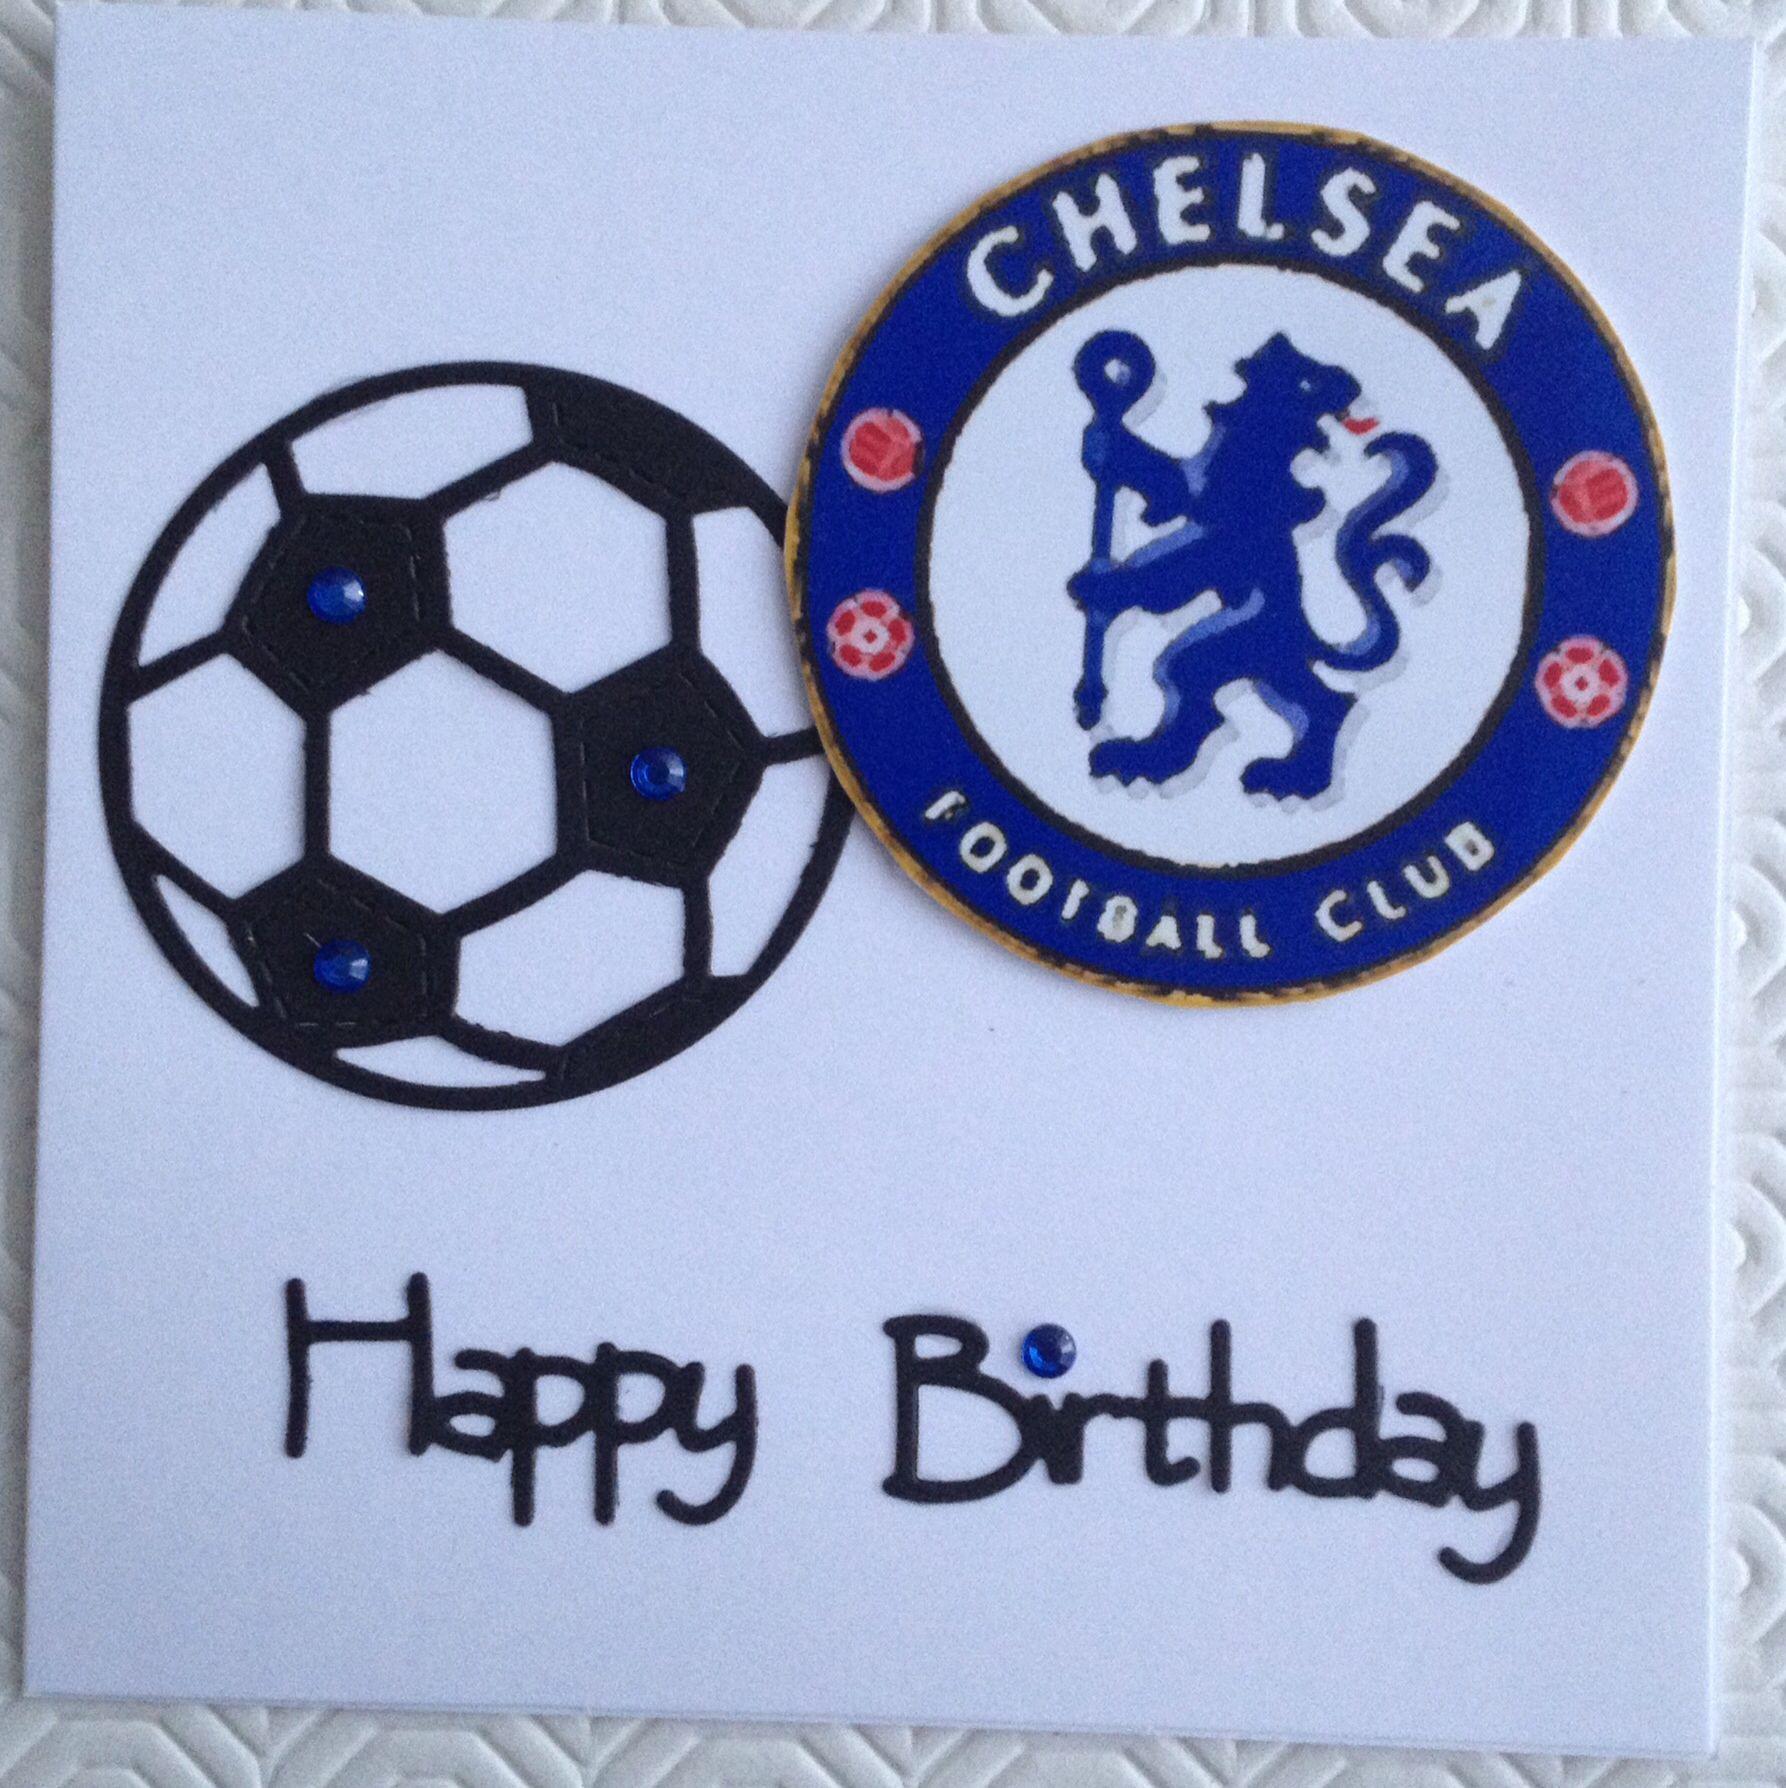 Chelsea Football Card Birthday Cards For Men Cards Handmade Birthday Cards